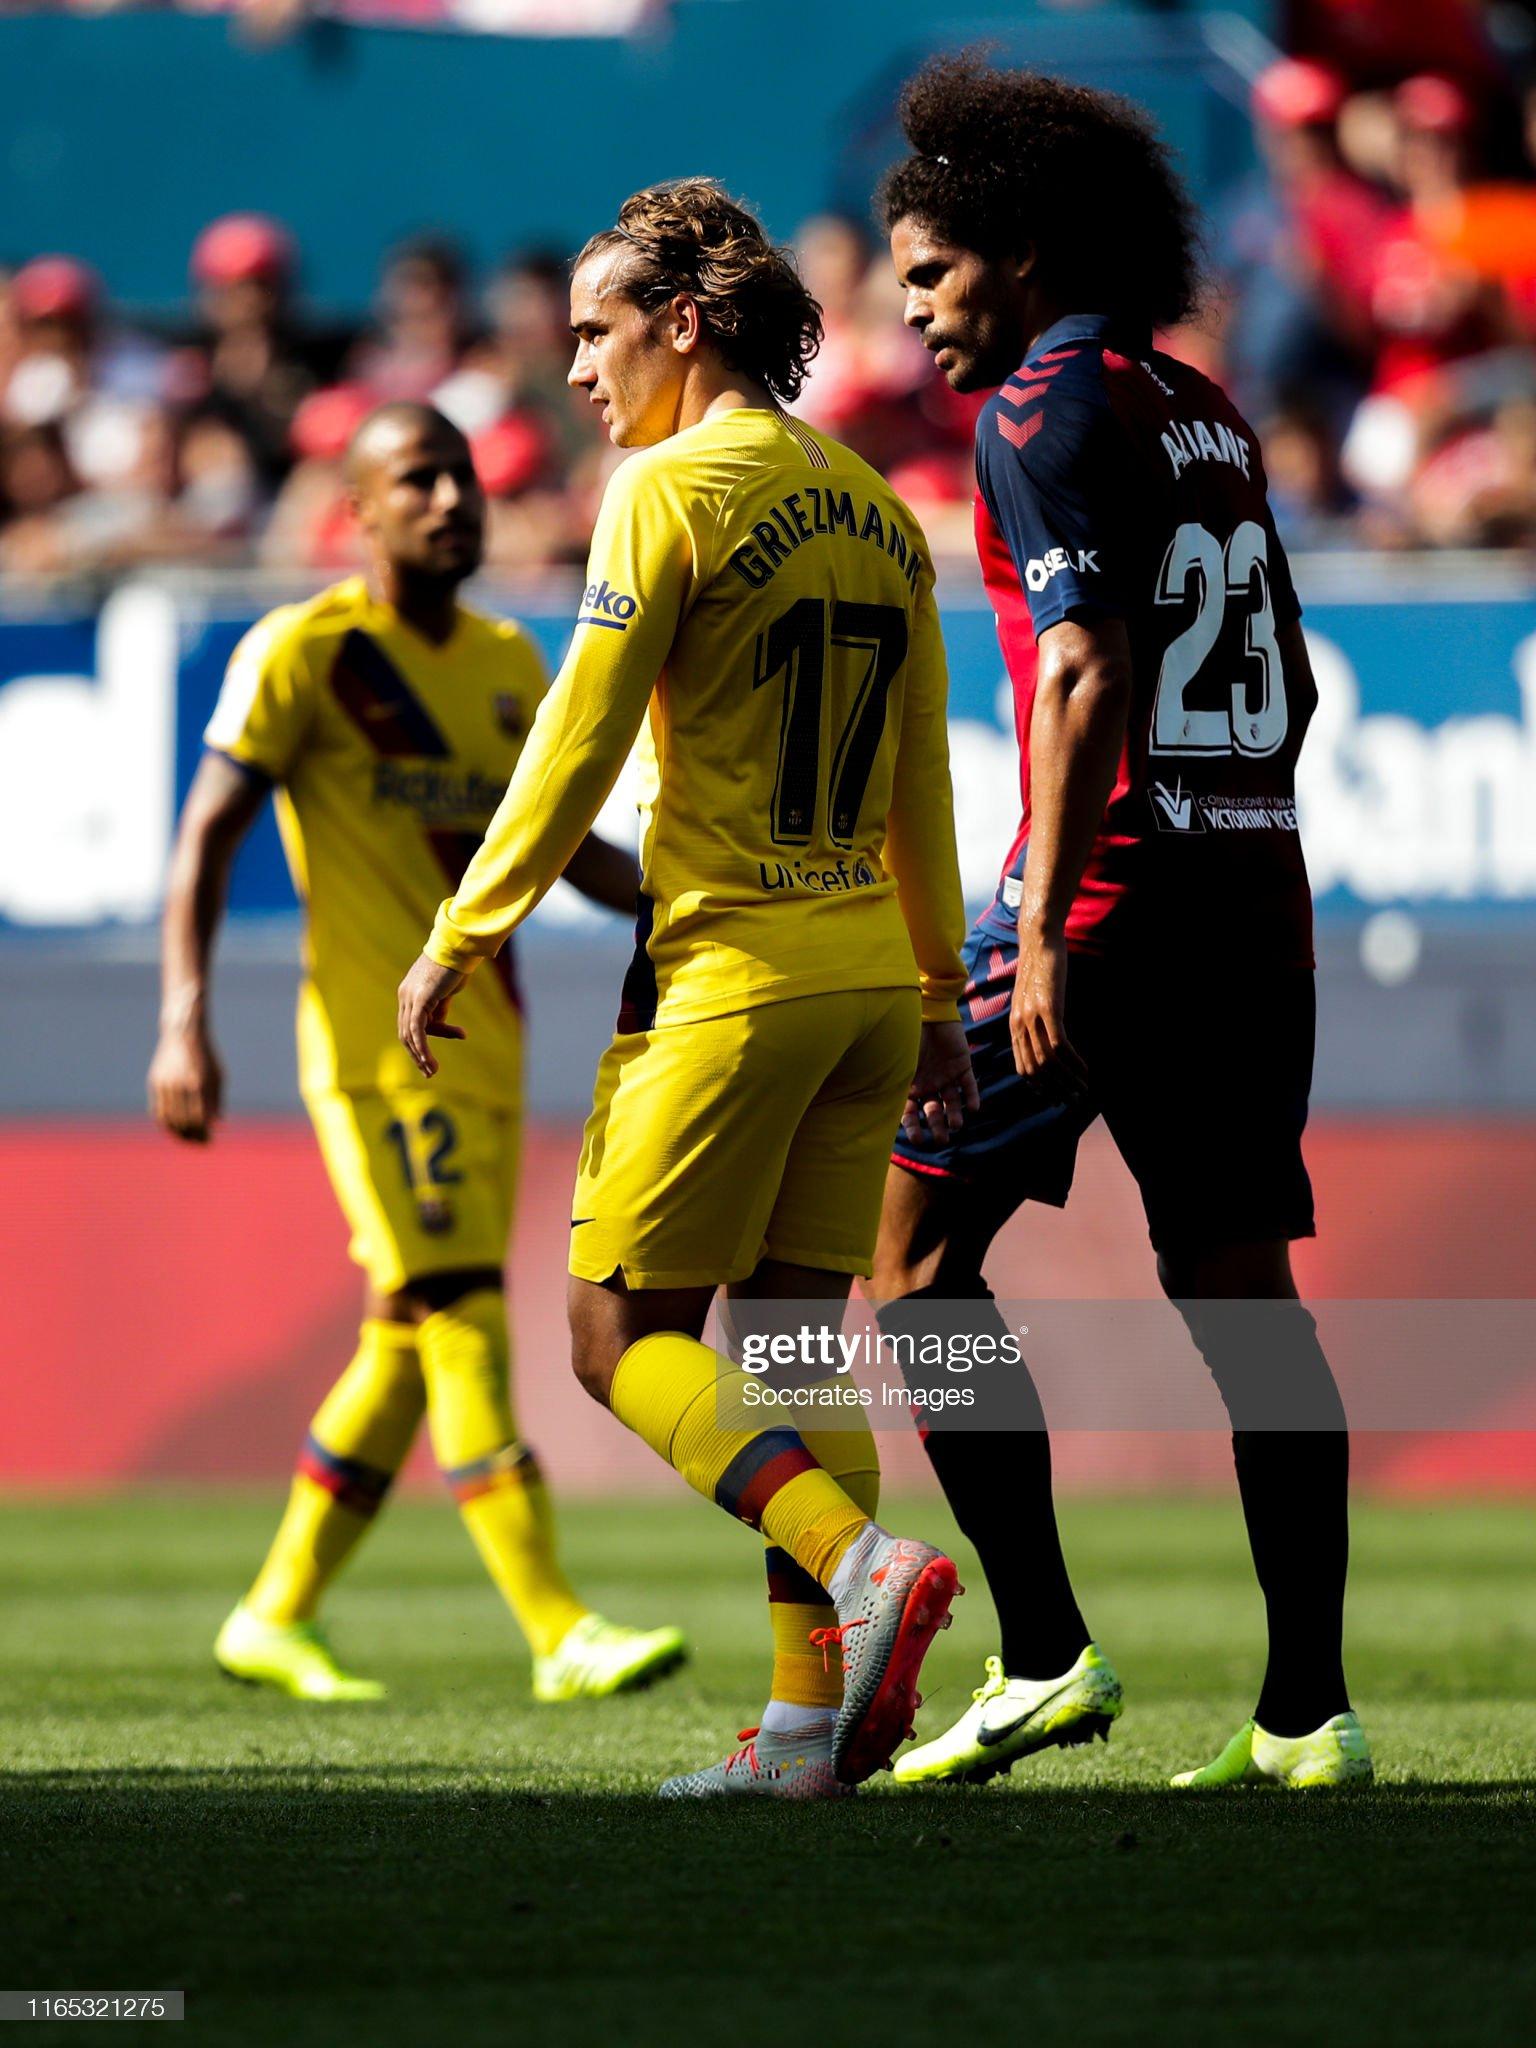 صور مباراة : أوساسونا - برشلونة 2-2 ( 31-08-2019 )  Antoine-griezmann-of-fc-barcelona-during-the-la-liga-santander-match-picture-id1165321275?s=2048x2048